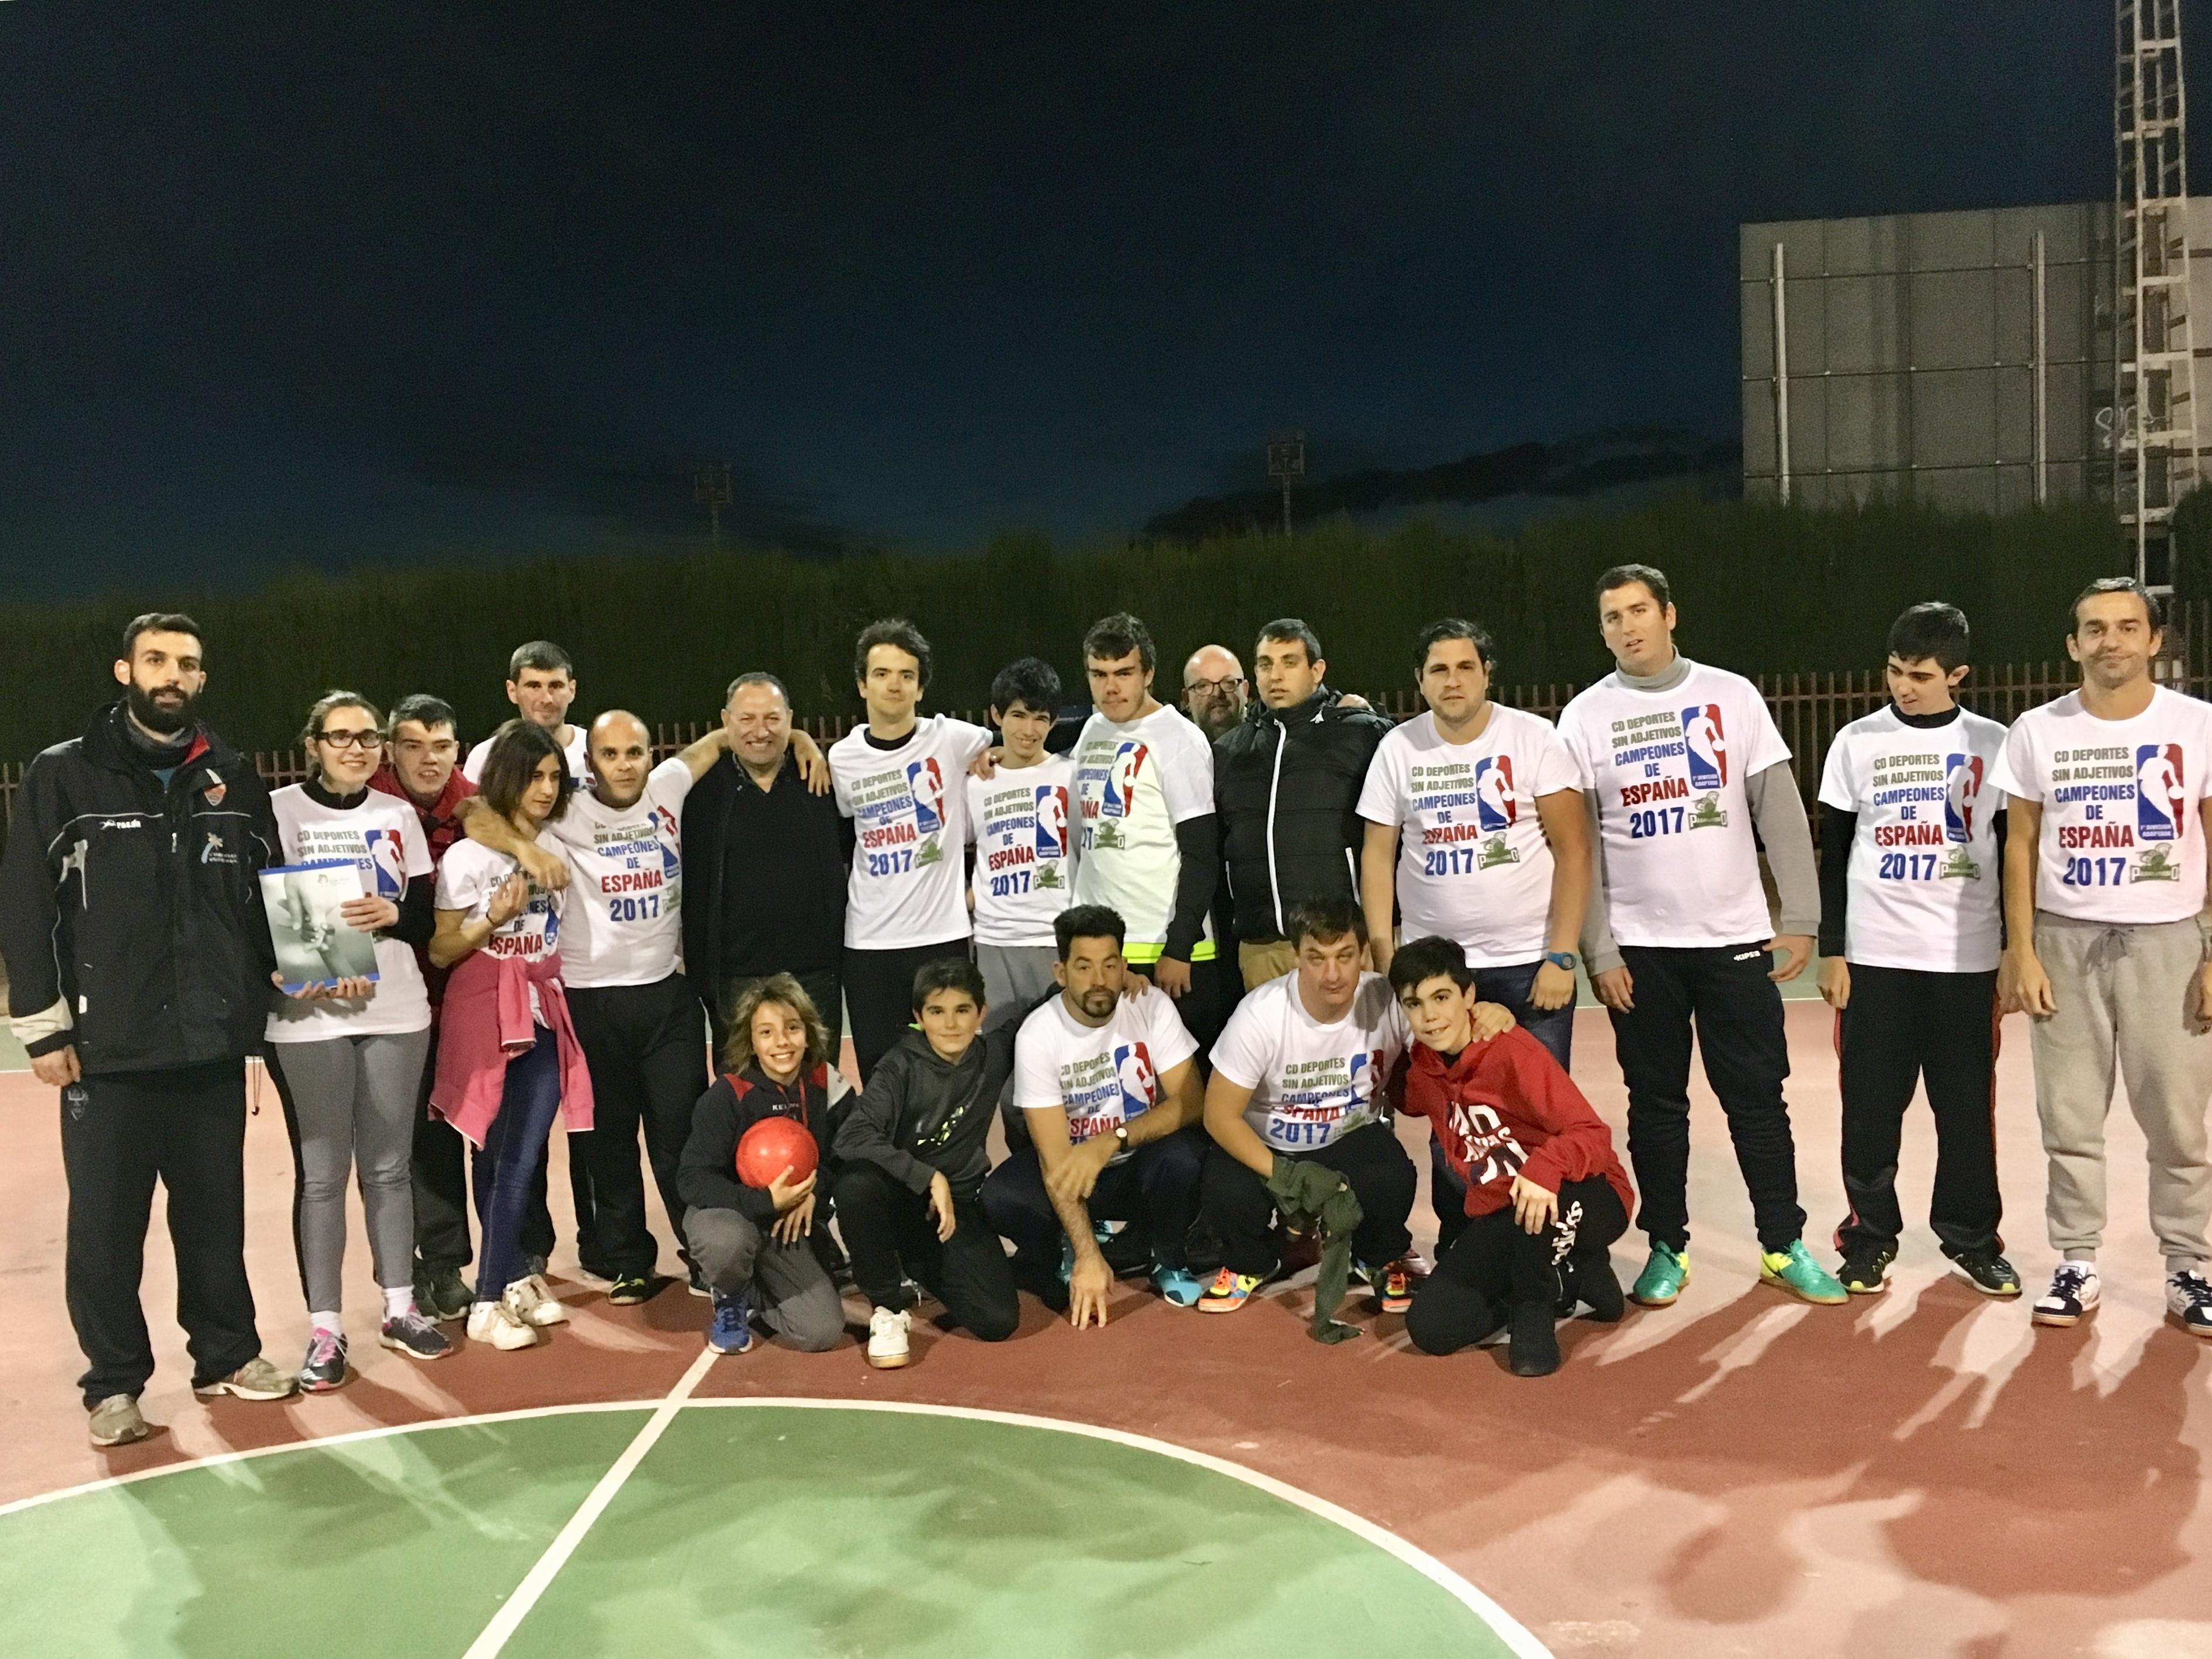 deportes-sin-adjetivos-fundacion-juan-peran-pikolinos